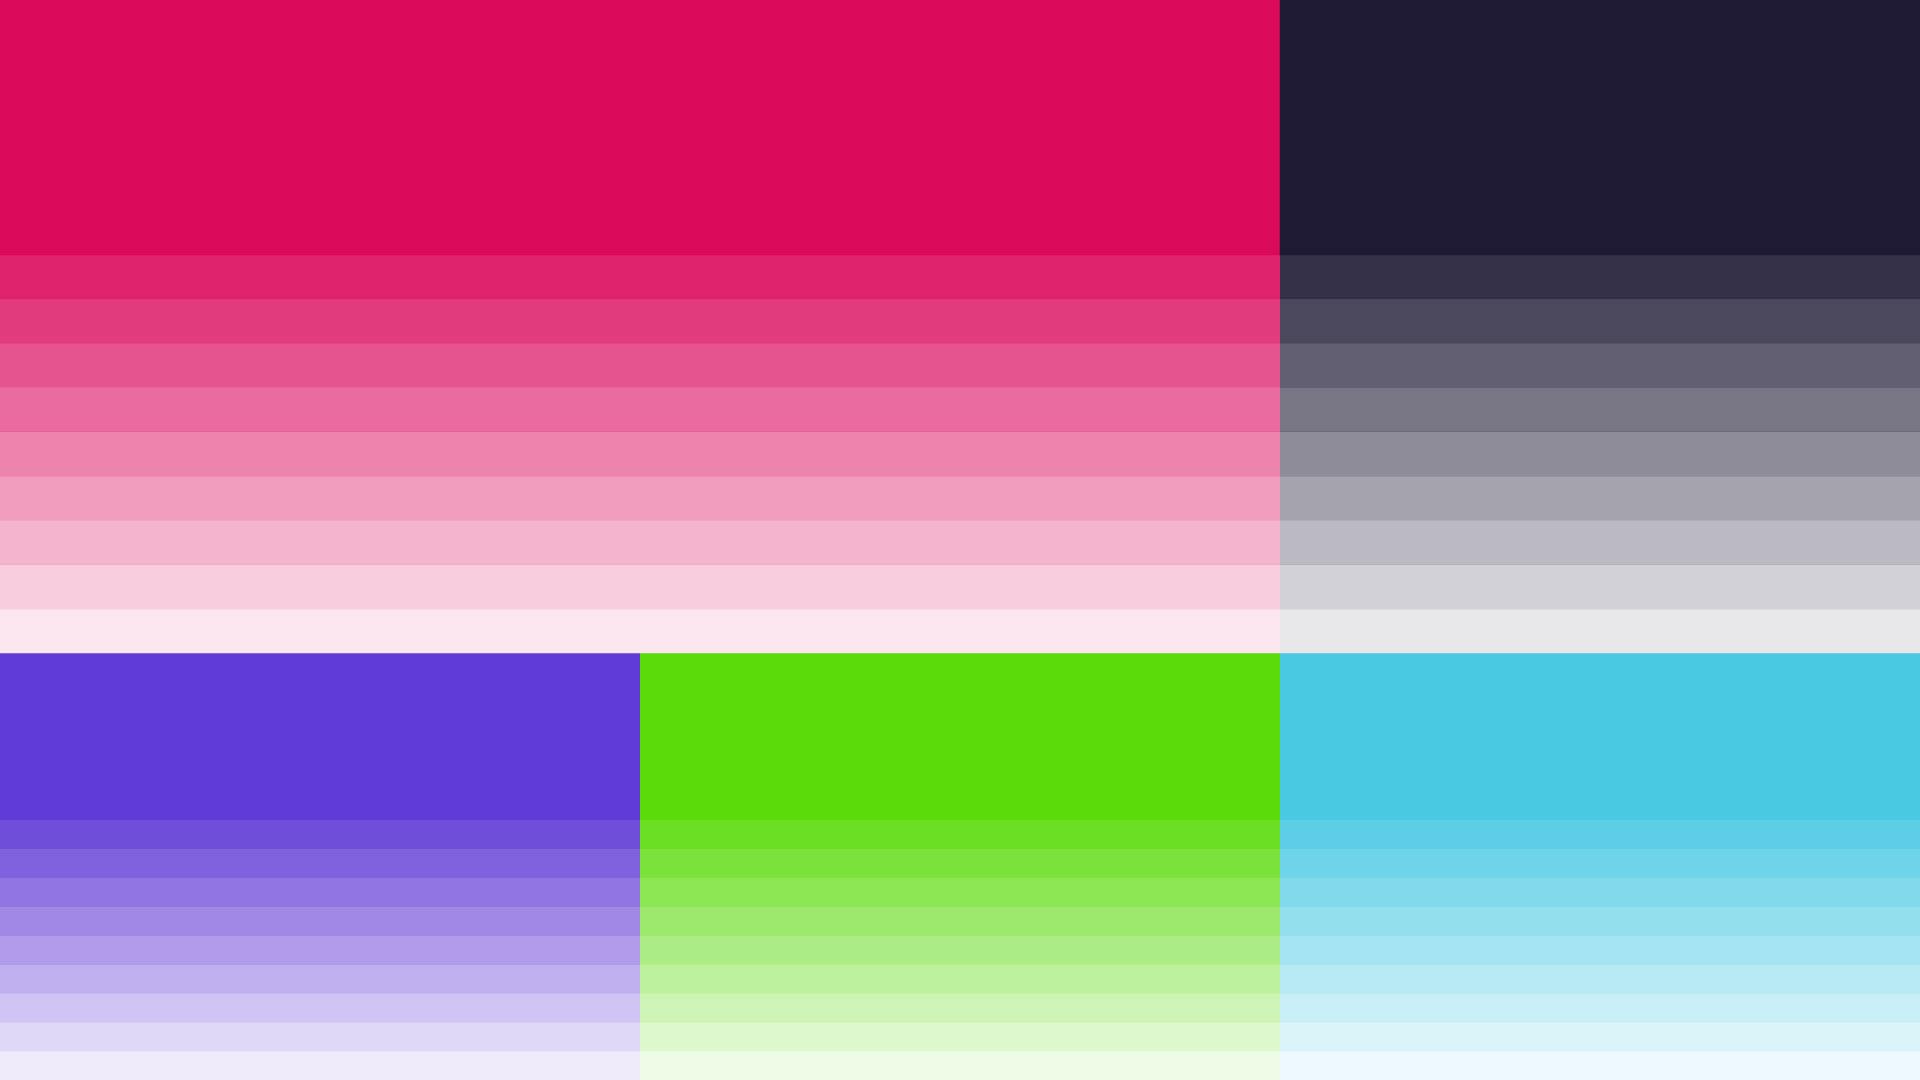 Wssel-Digital-Brandkit-03